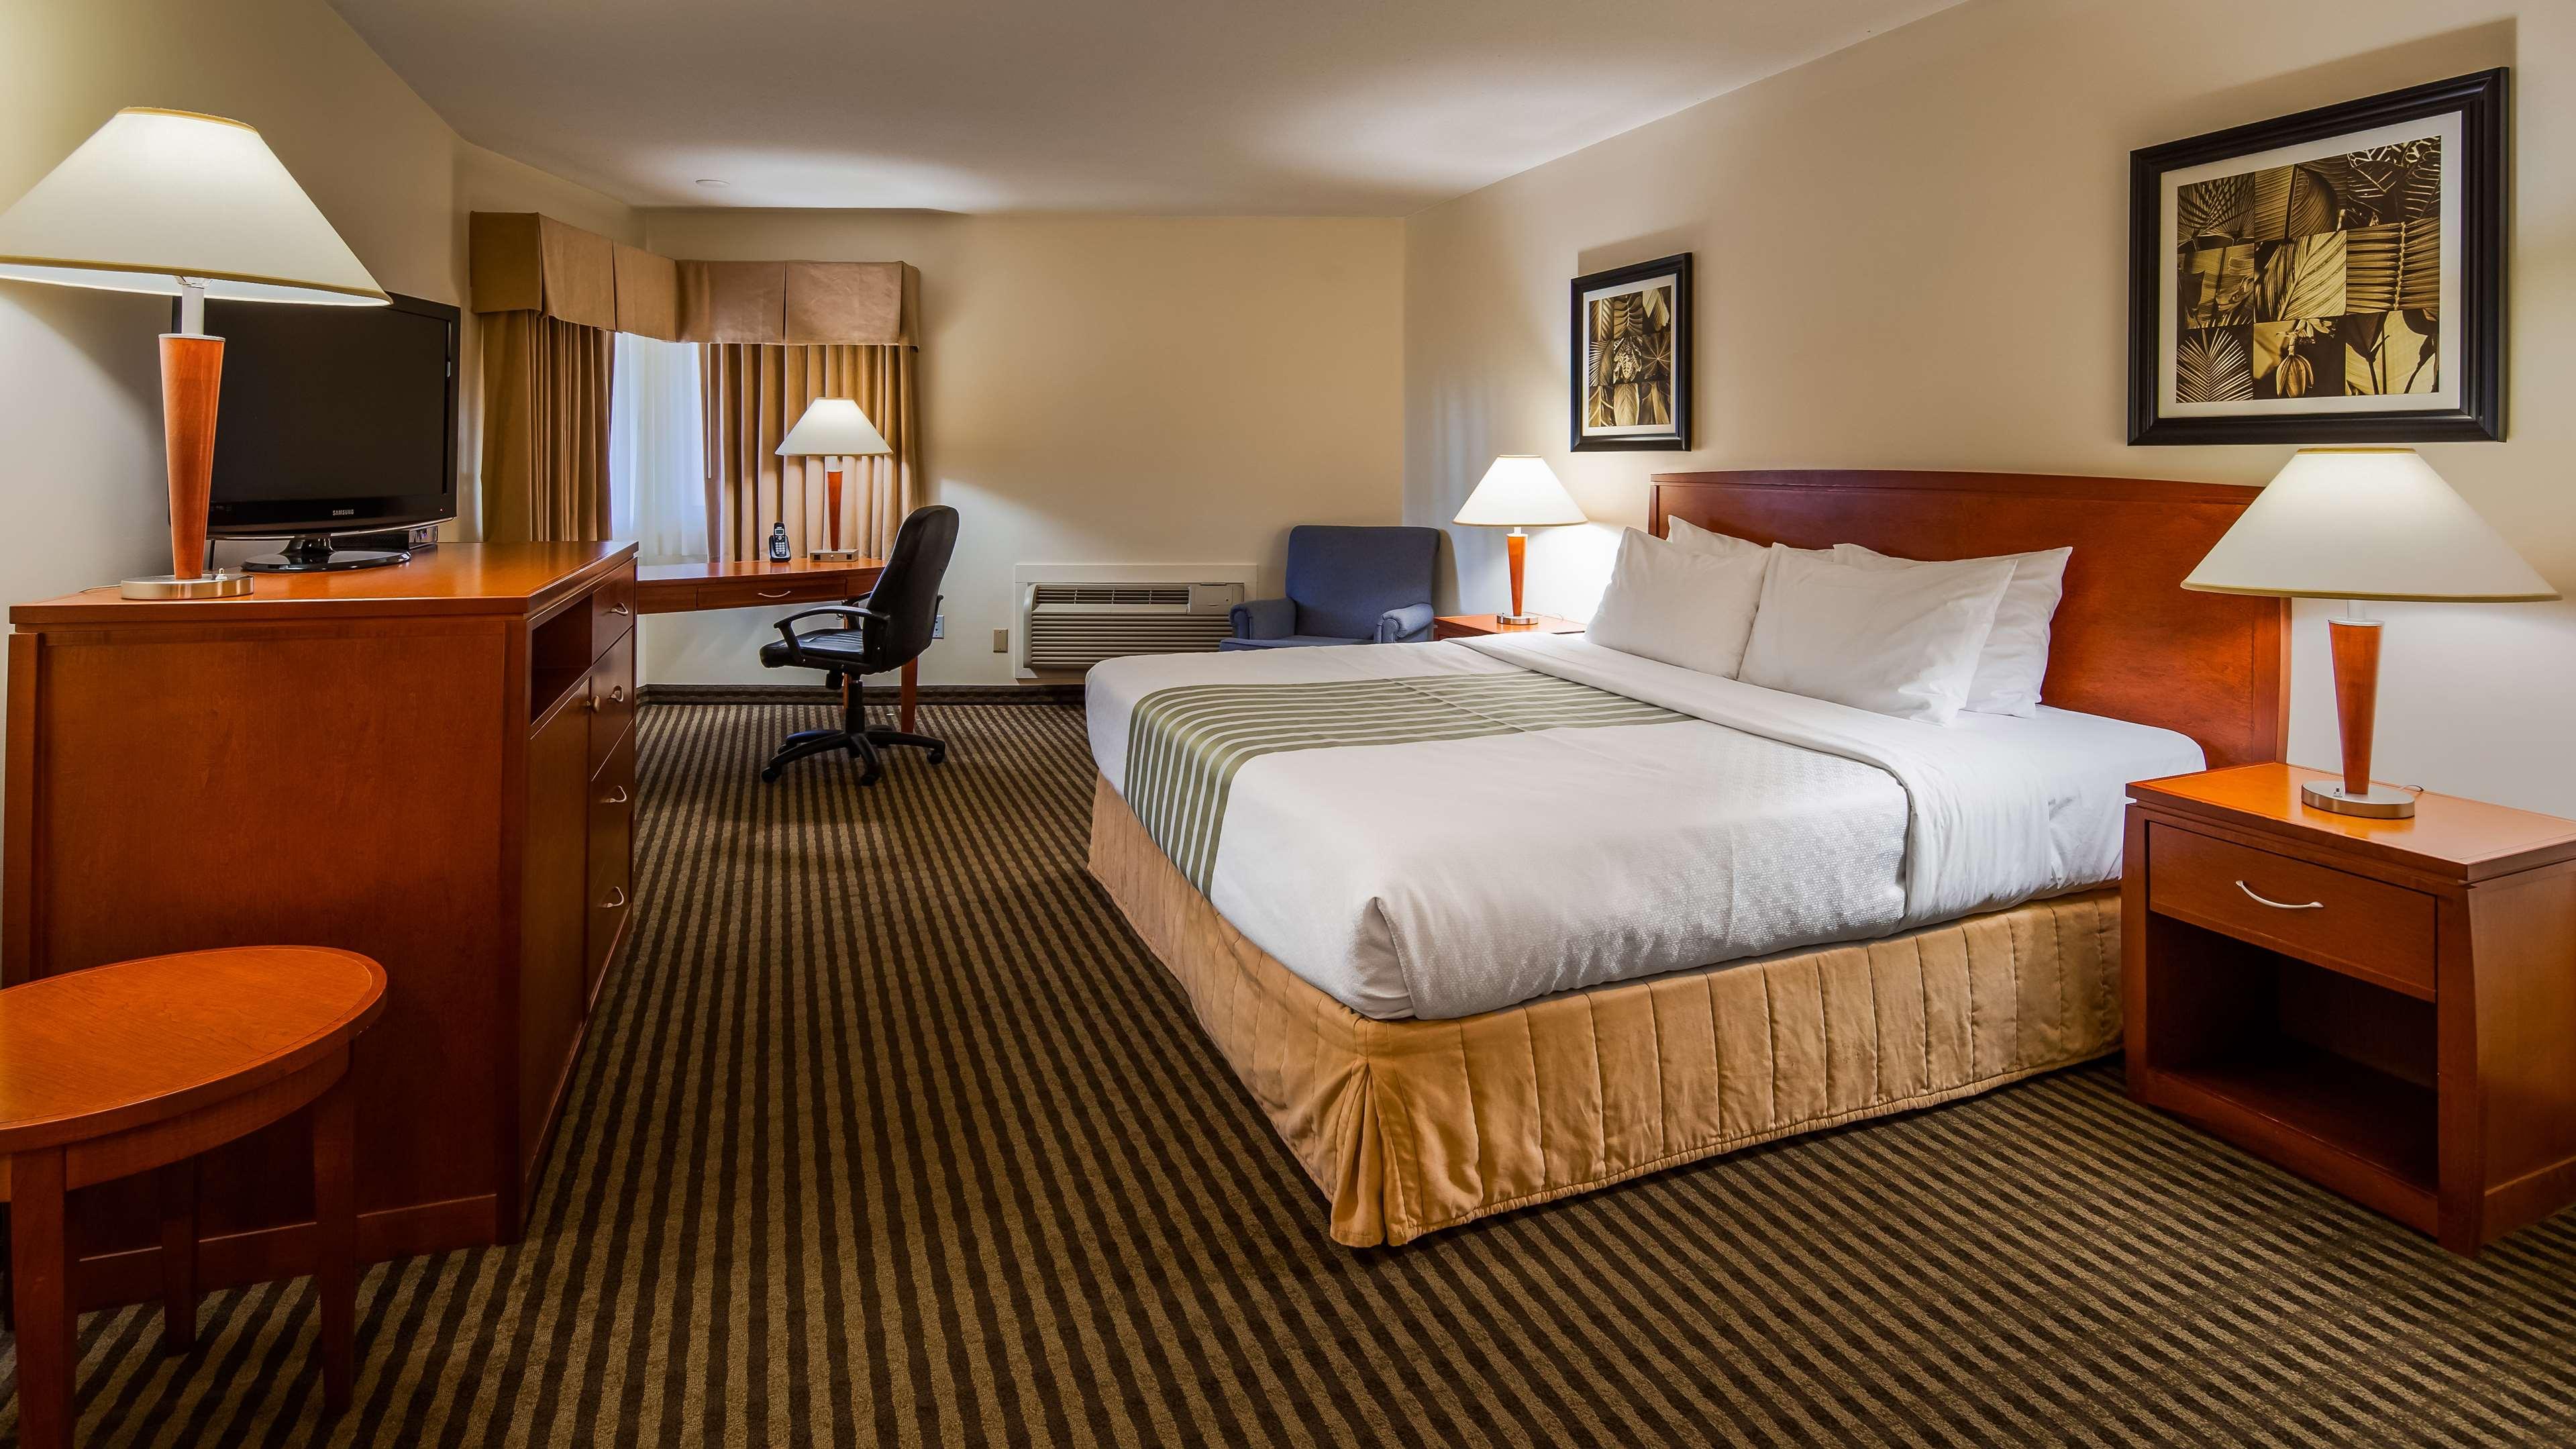 Surestay Hotel By Best Western Chilliwack in Chilliwack: King Guest Room